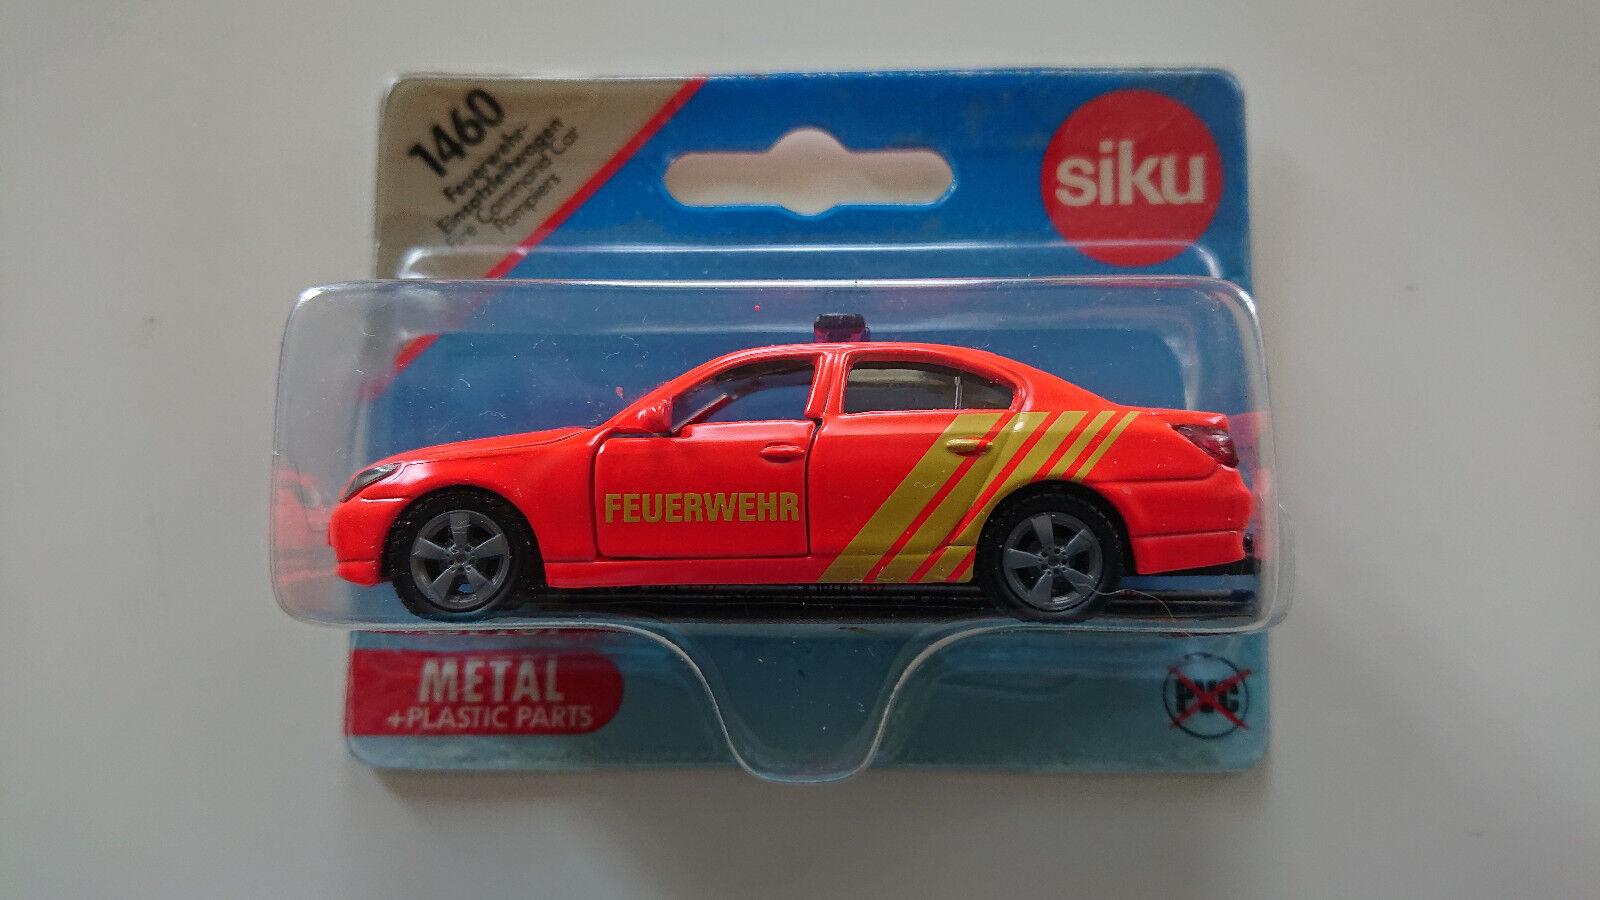 ventas directas de fábrica Siku 1460 1460 1460 bmw 545i bomberos OVP Mint muy raras  auténtico